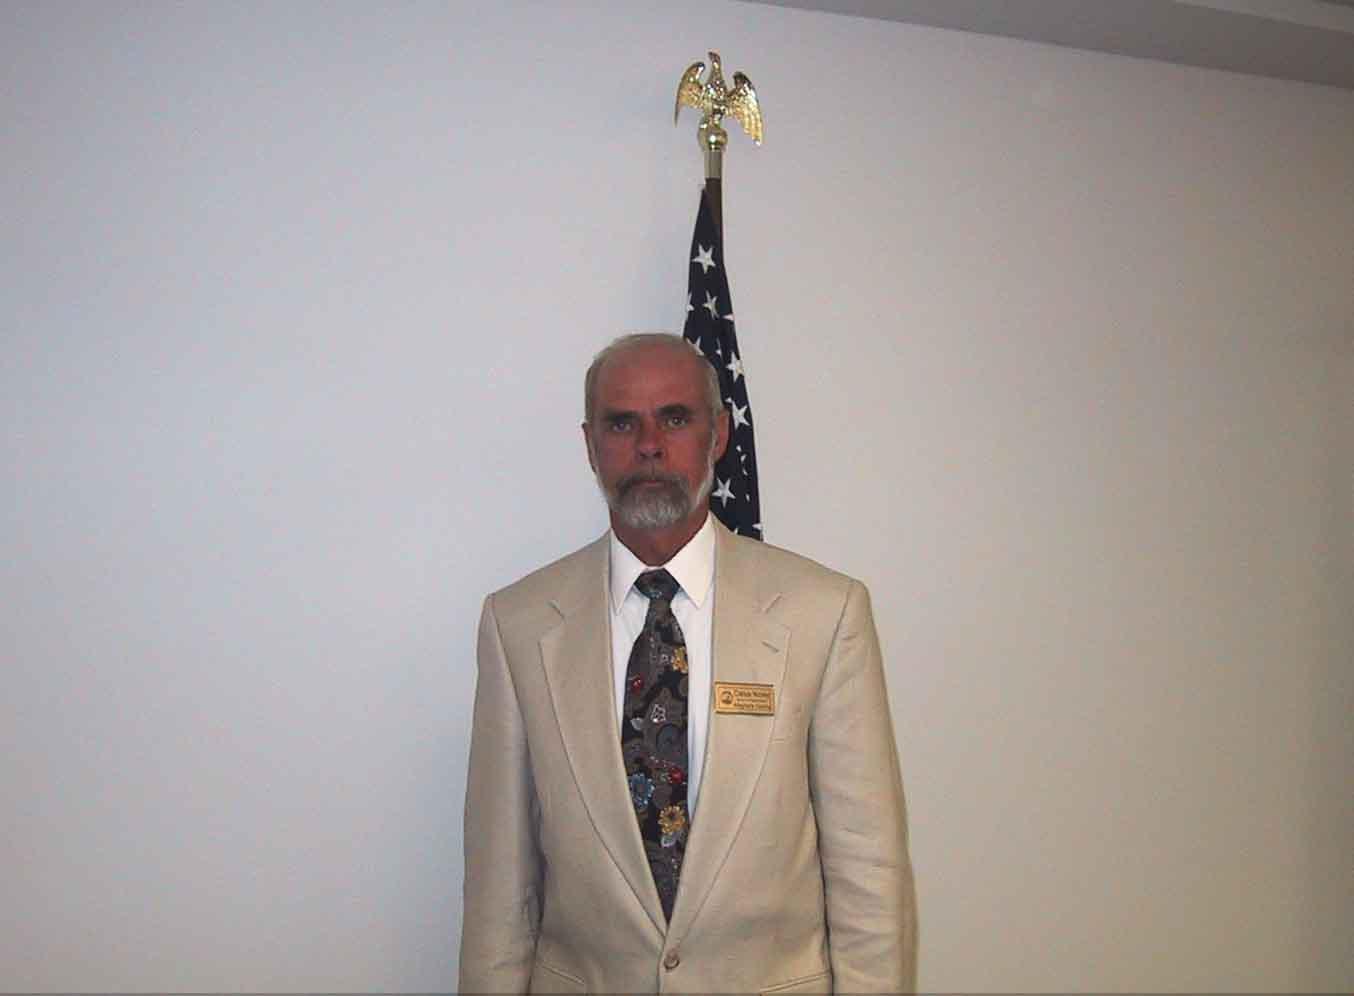 Alleghany Co VA Board of Supervisors Member - Cletus Nicely